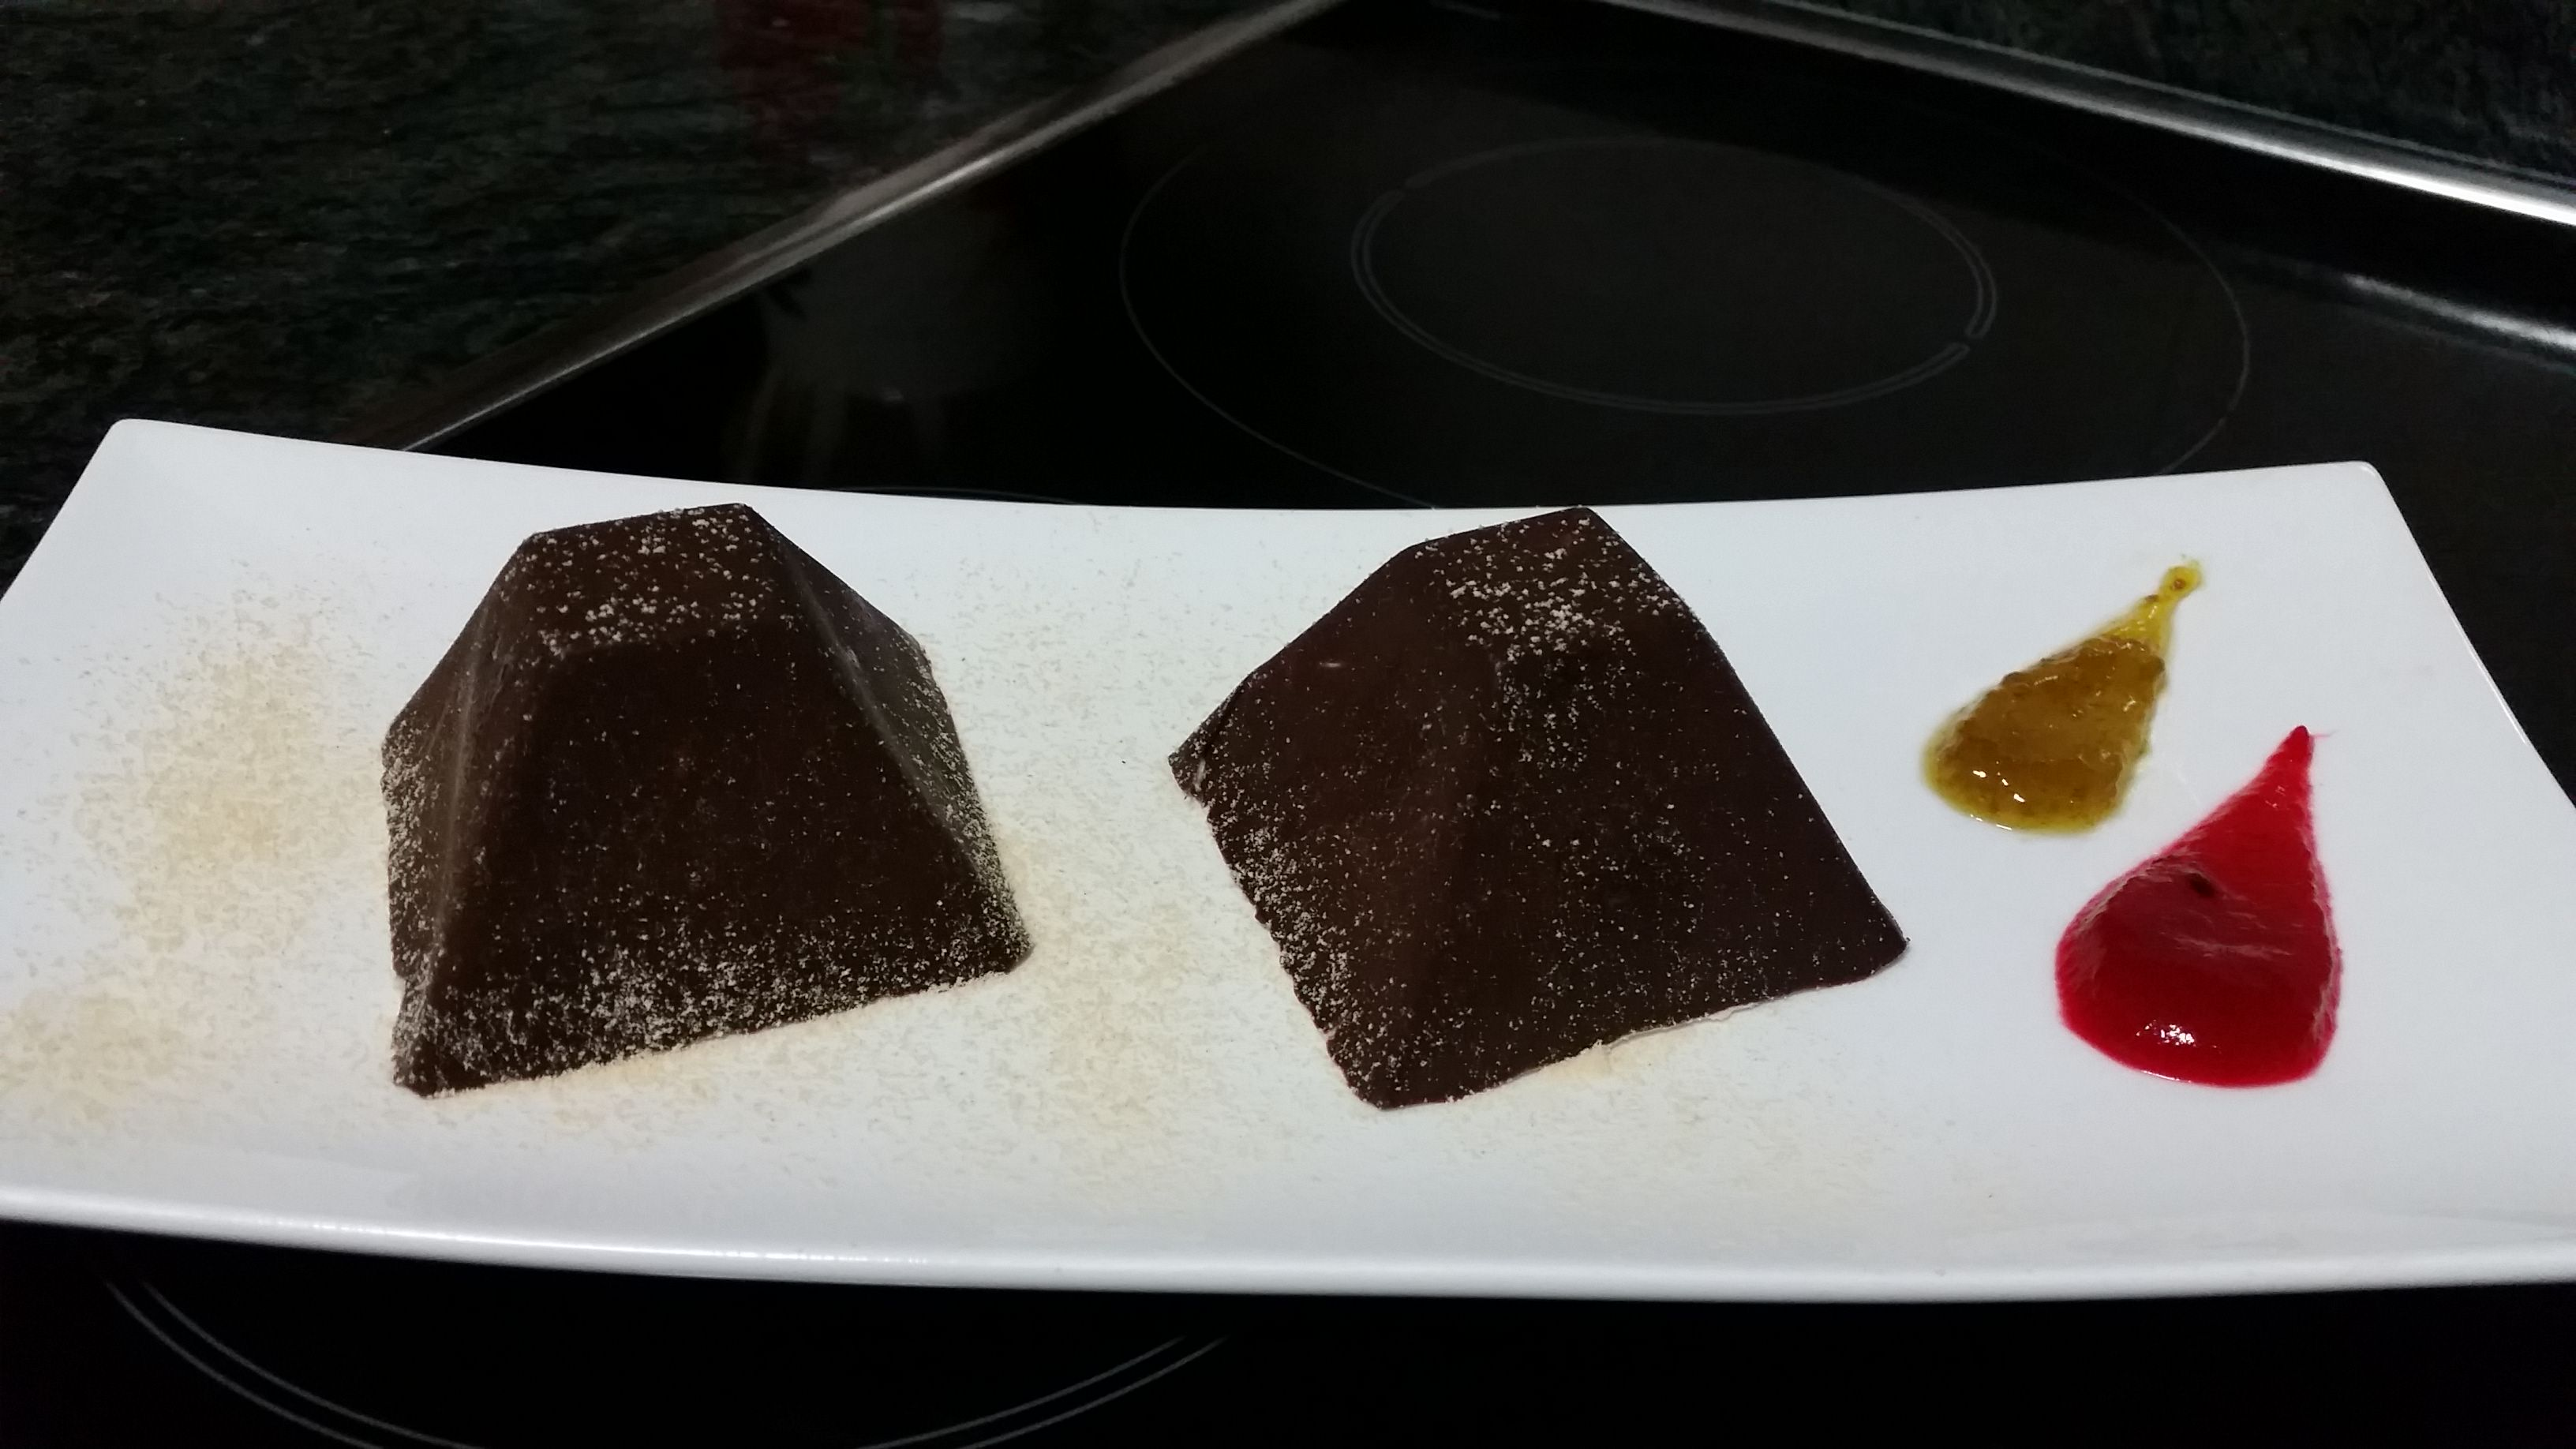 PIRÁMIDE DE CHOCOLATE RELLENA DE MOUSSE DE GOFIO